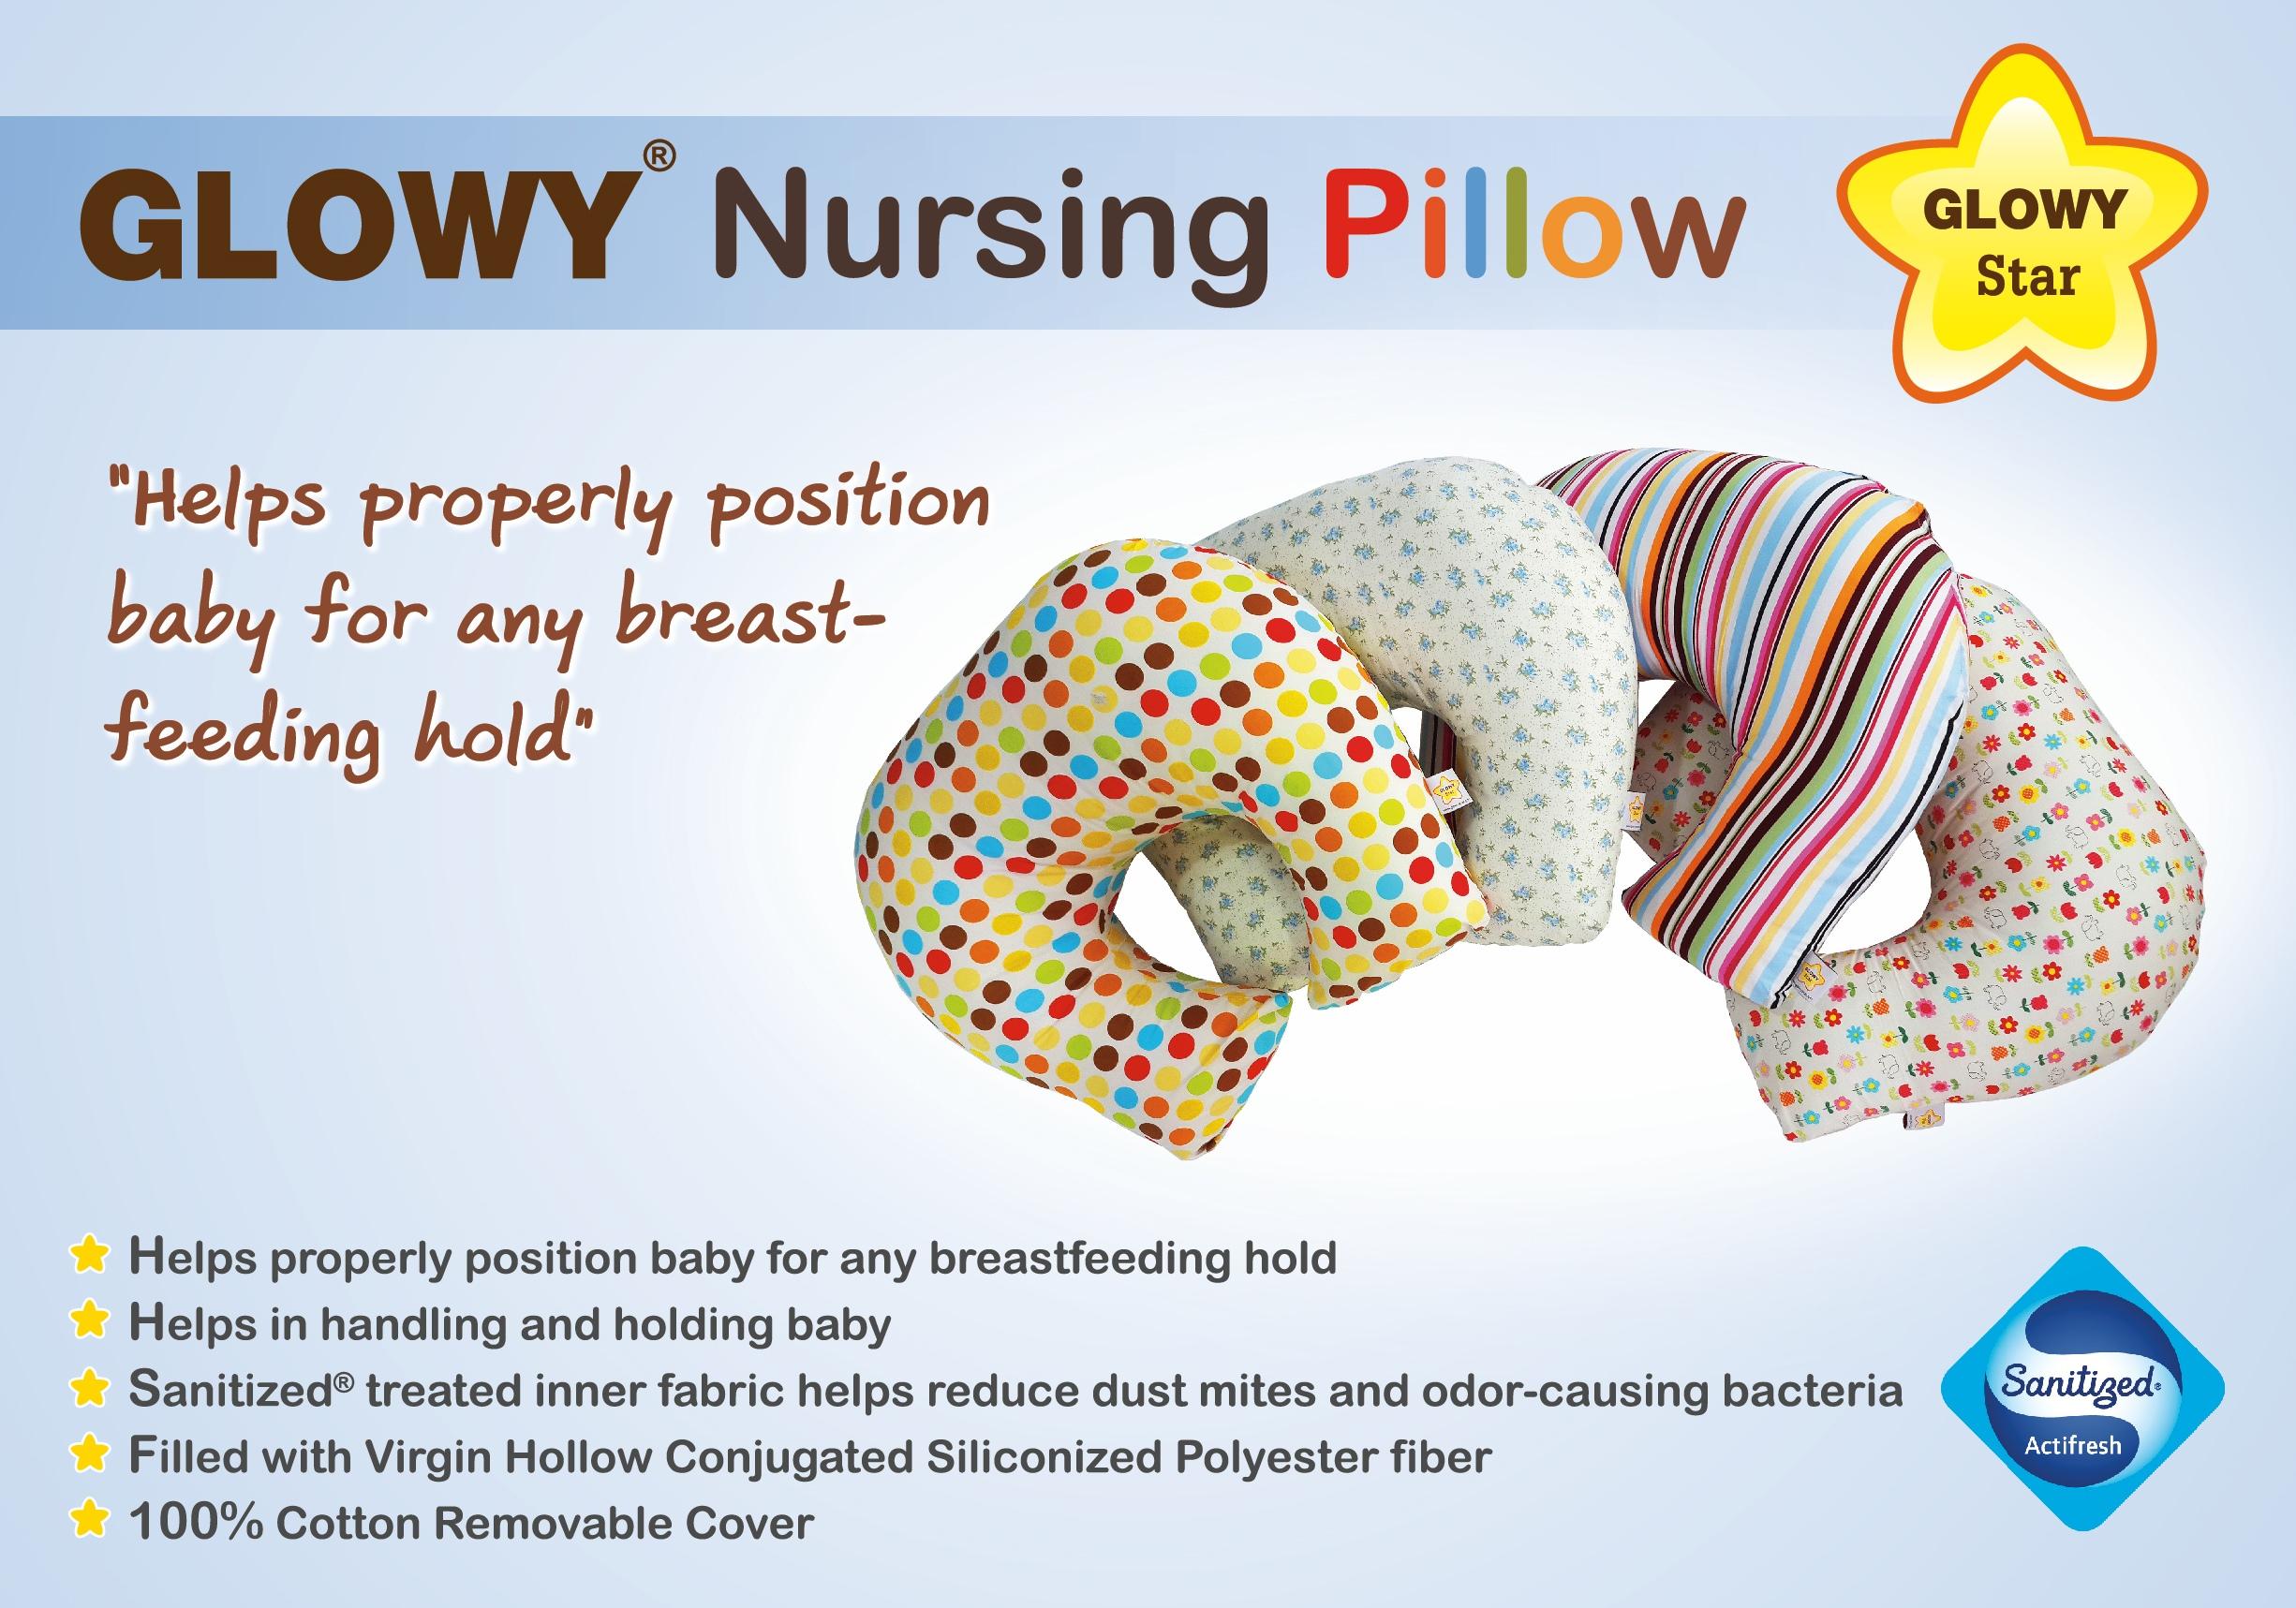 Glowy Star Nursing Pillow หมอนให้นม หมอนรองให้นม ***ราคาปกติ 1,140 โปรโมชั่นเหลือ 850 บาทมีค่าส่งเพิ่ม 150 บาท โดยค่าส่งได้รวมกับราคาข้างล่างแล้ว***